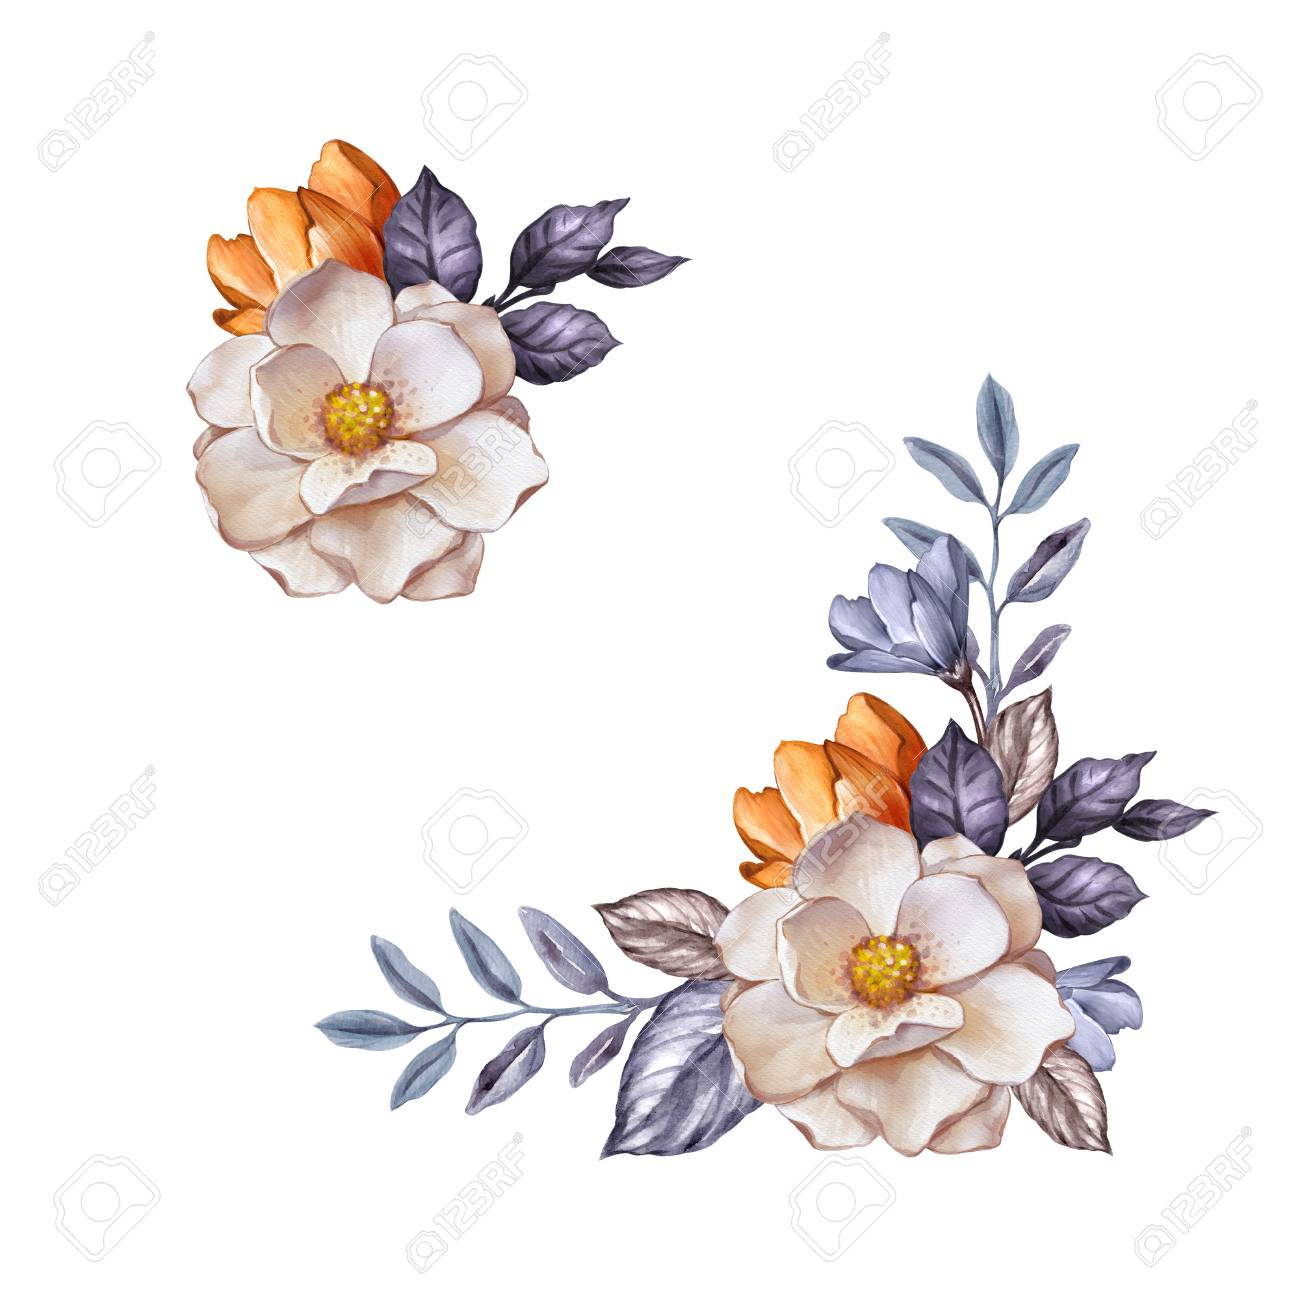 Aquarell Botanische Illustration Herbstblumen Getrocknete Blätter